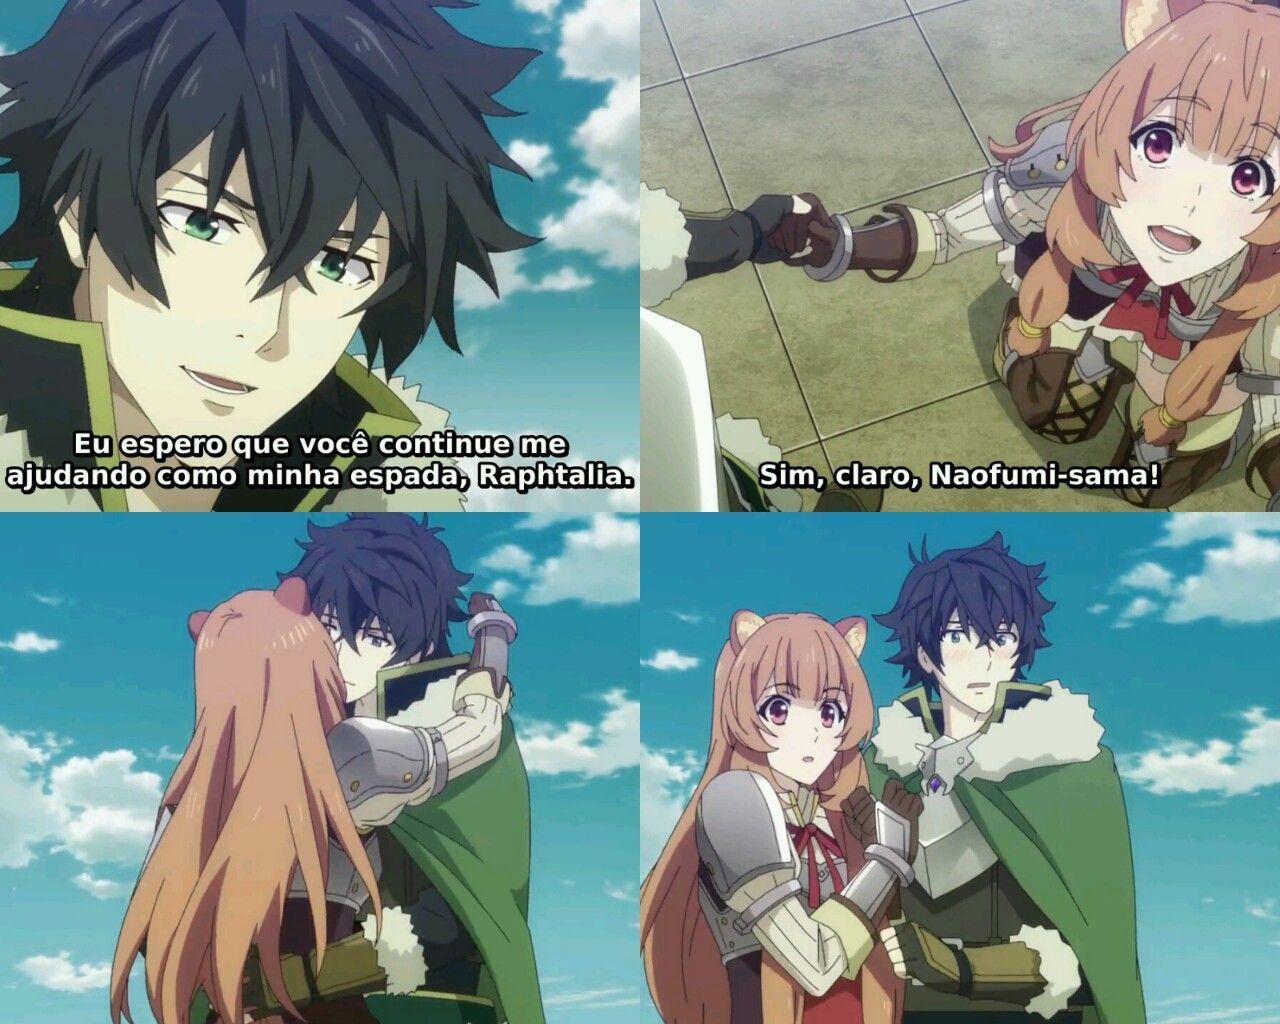 anime tate no yuusha naofumi raphtalia Memes engraçados